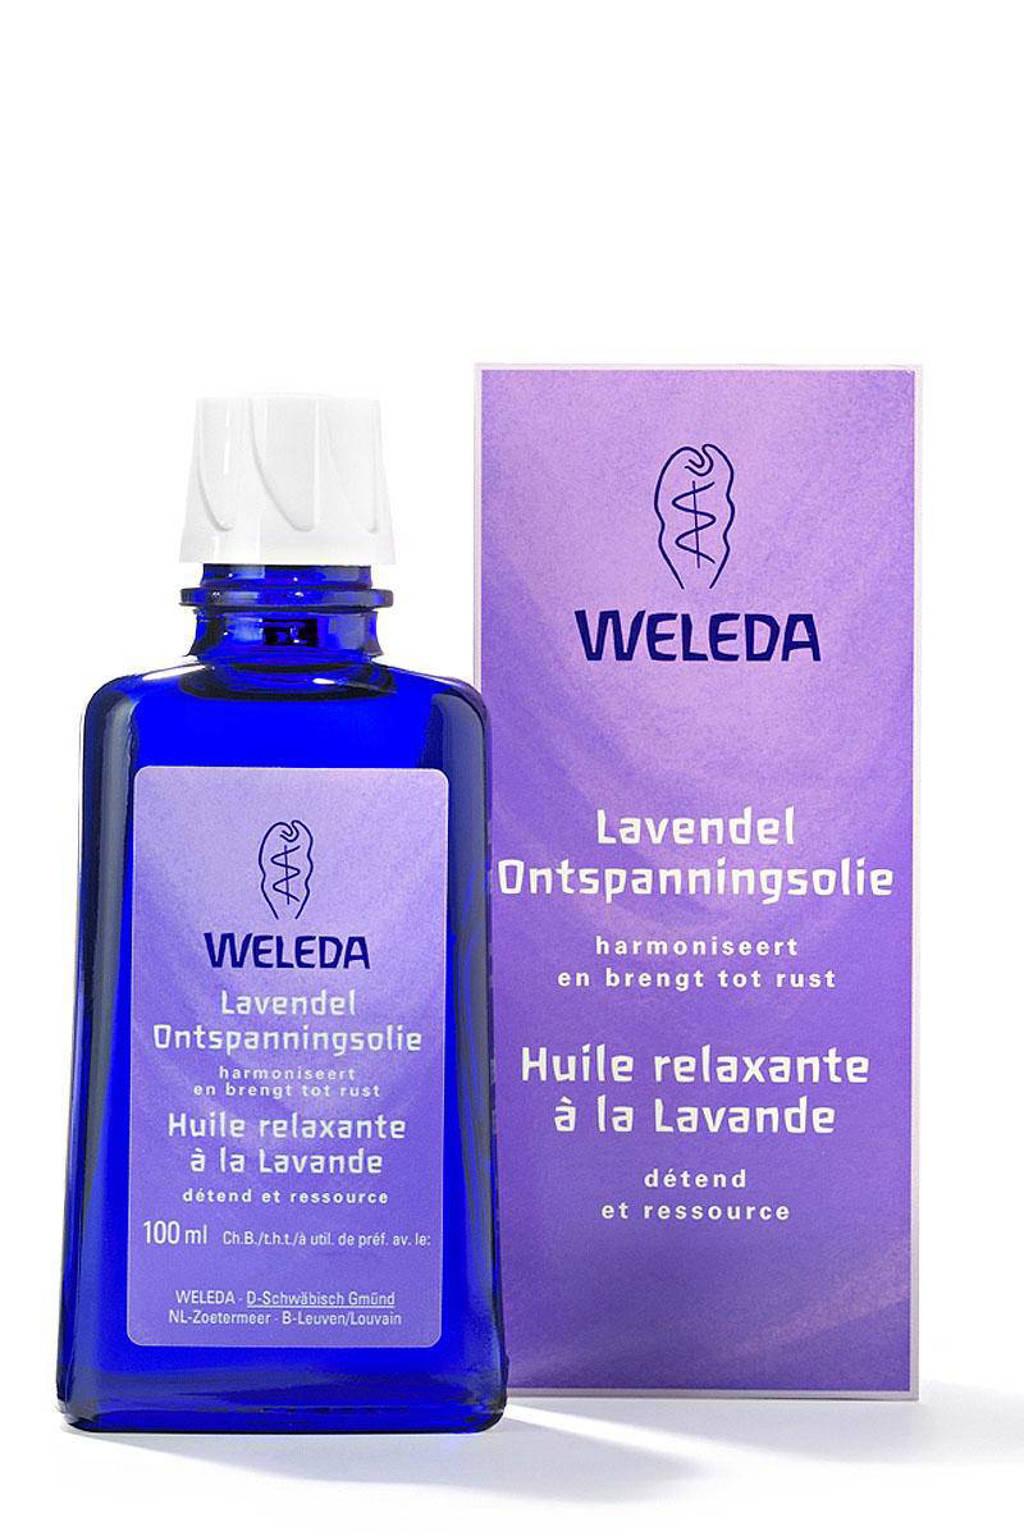 Weleda lavendel ontspanning bodyolie